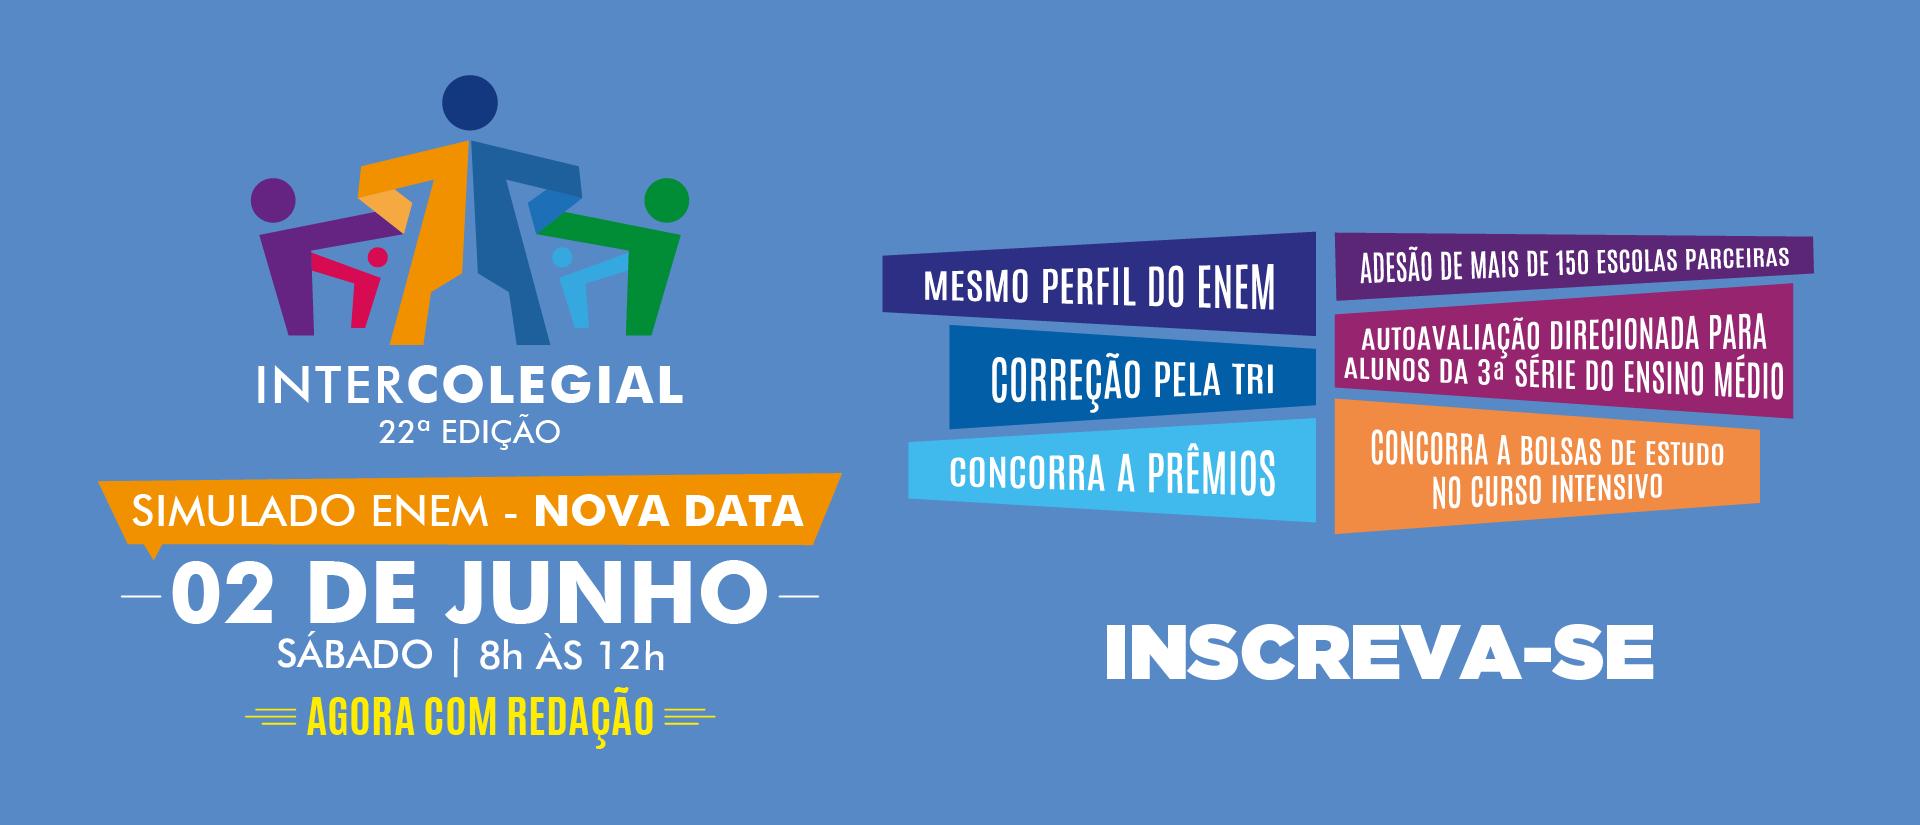 Slide Home - Intercolegial 2018 - NOVA DATA_img